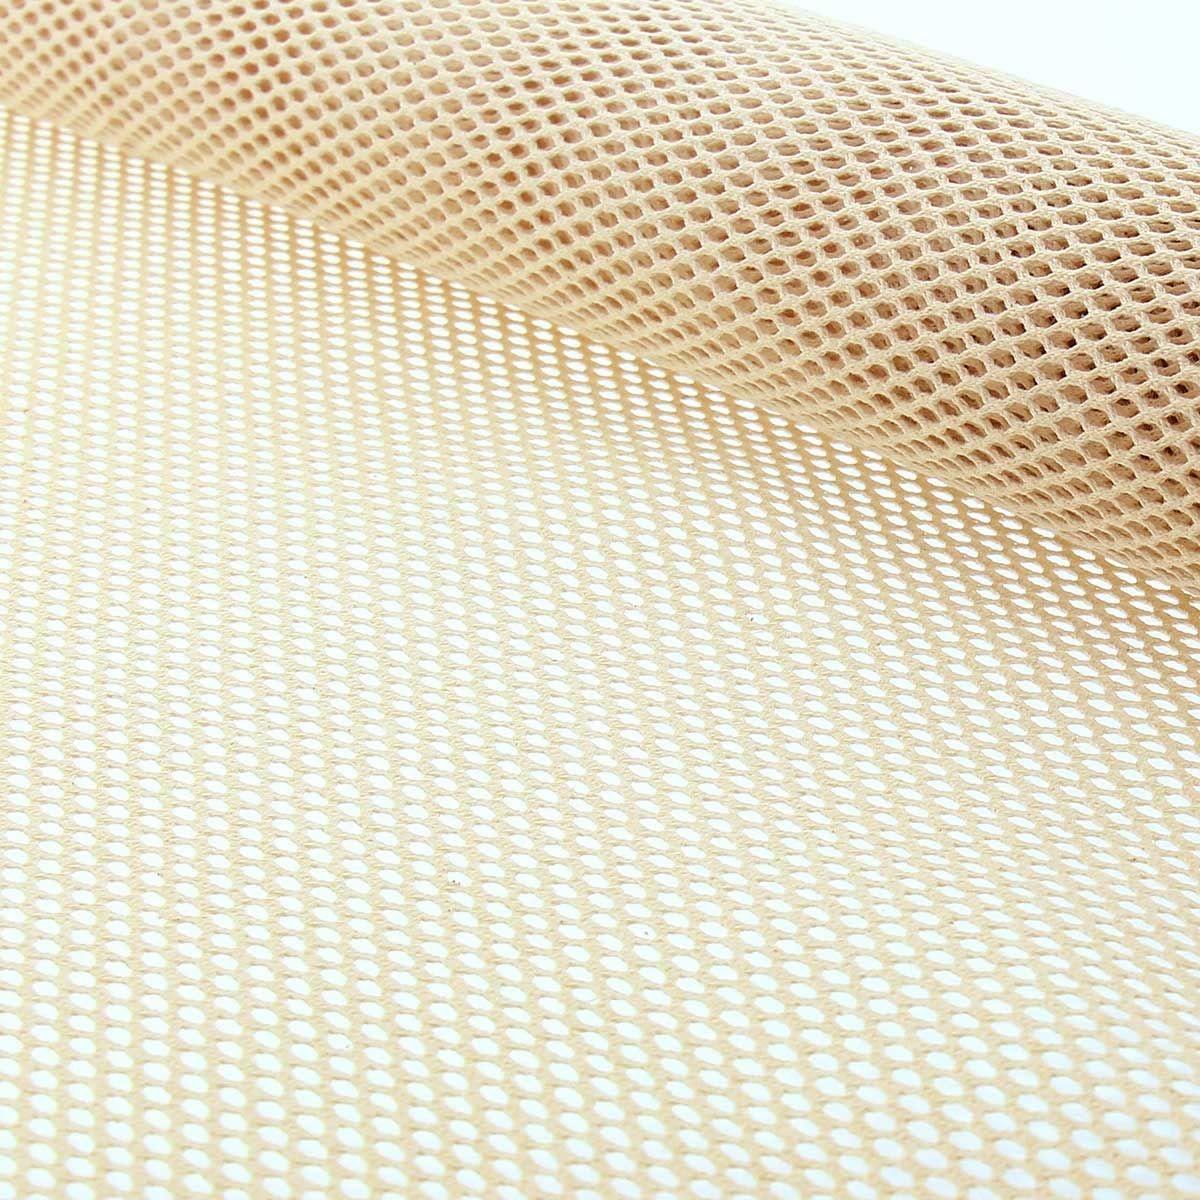 Tissu filet en coton bio - Naturel